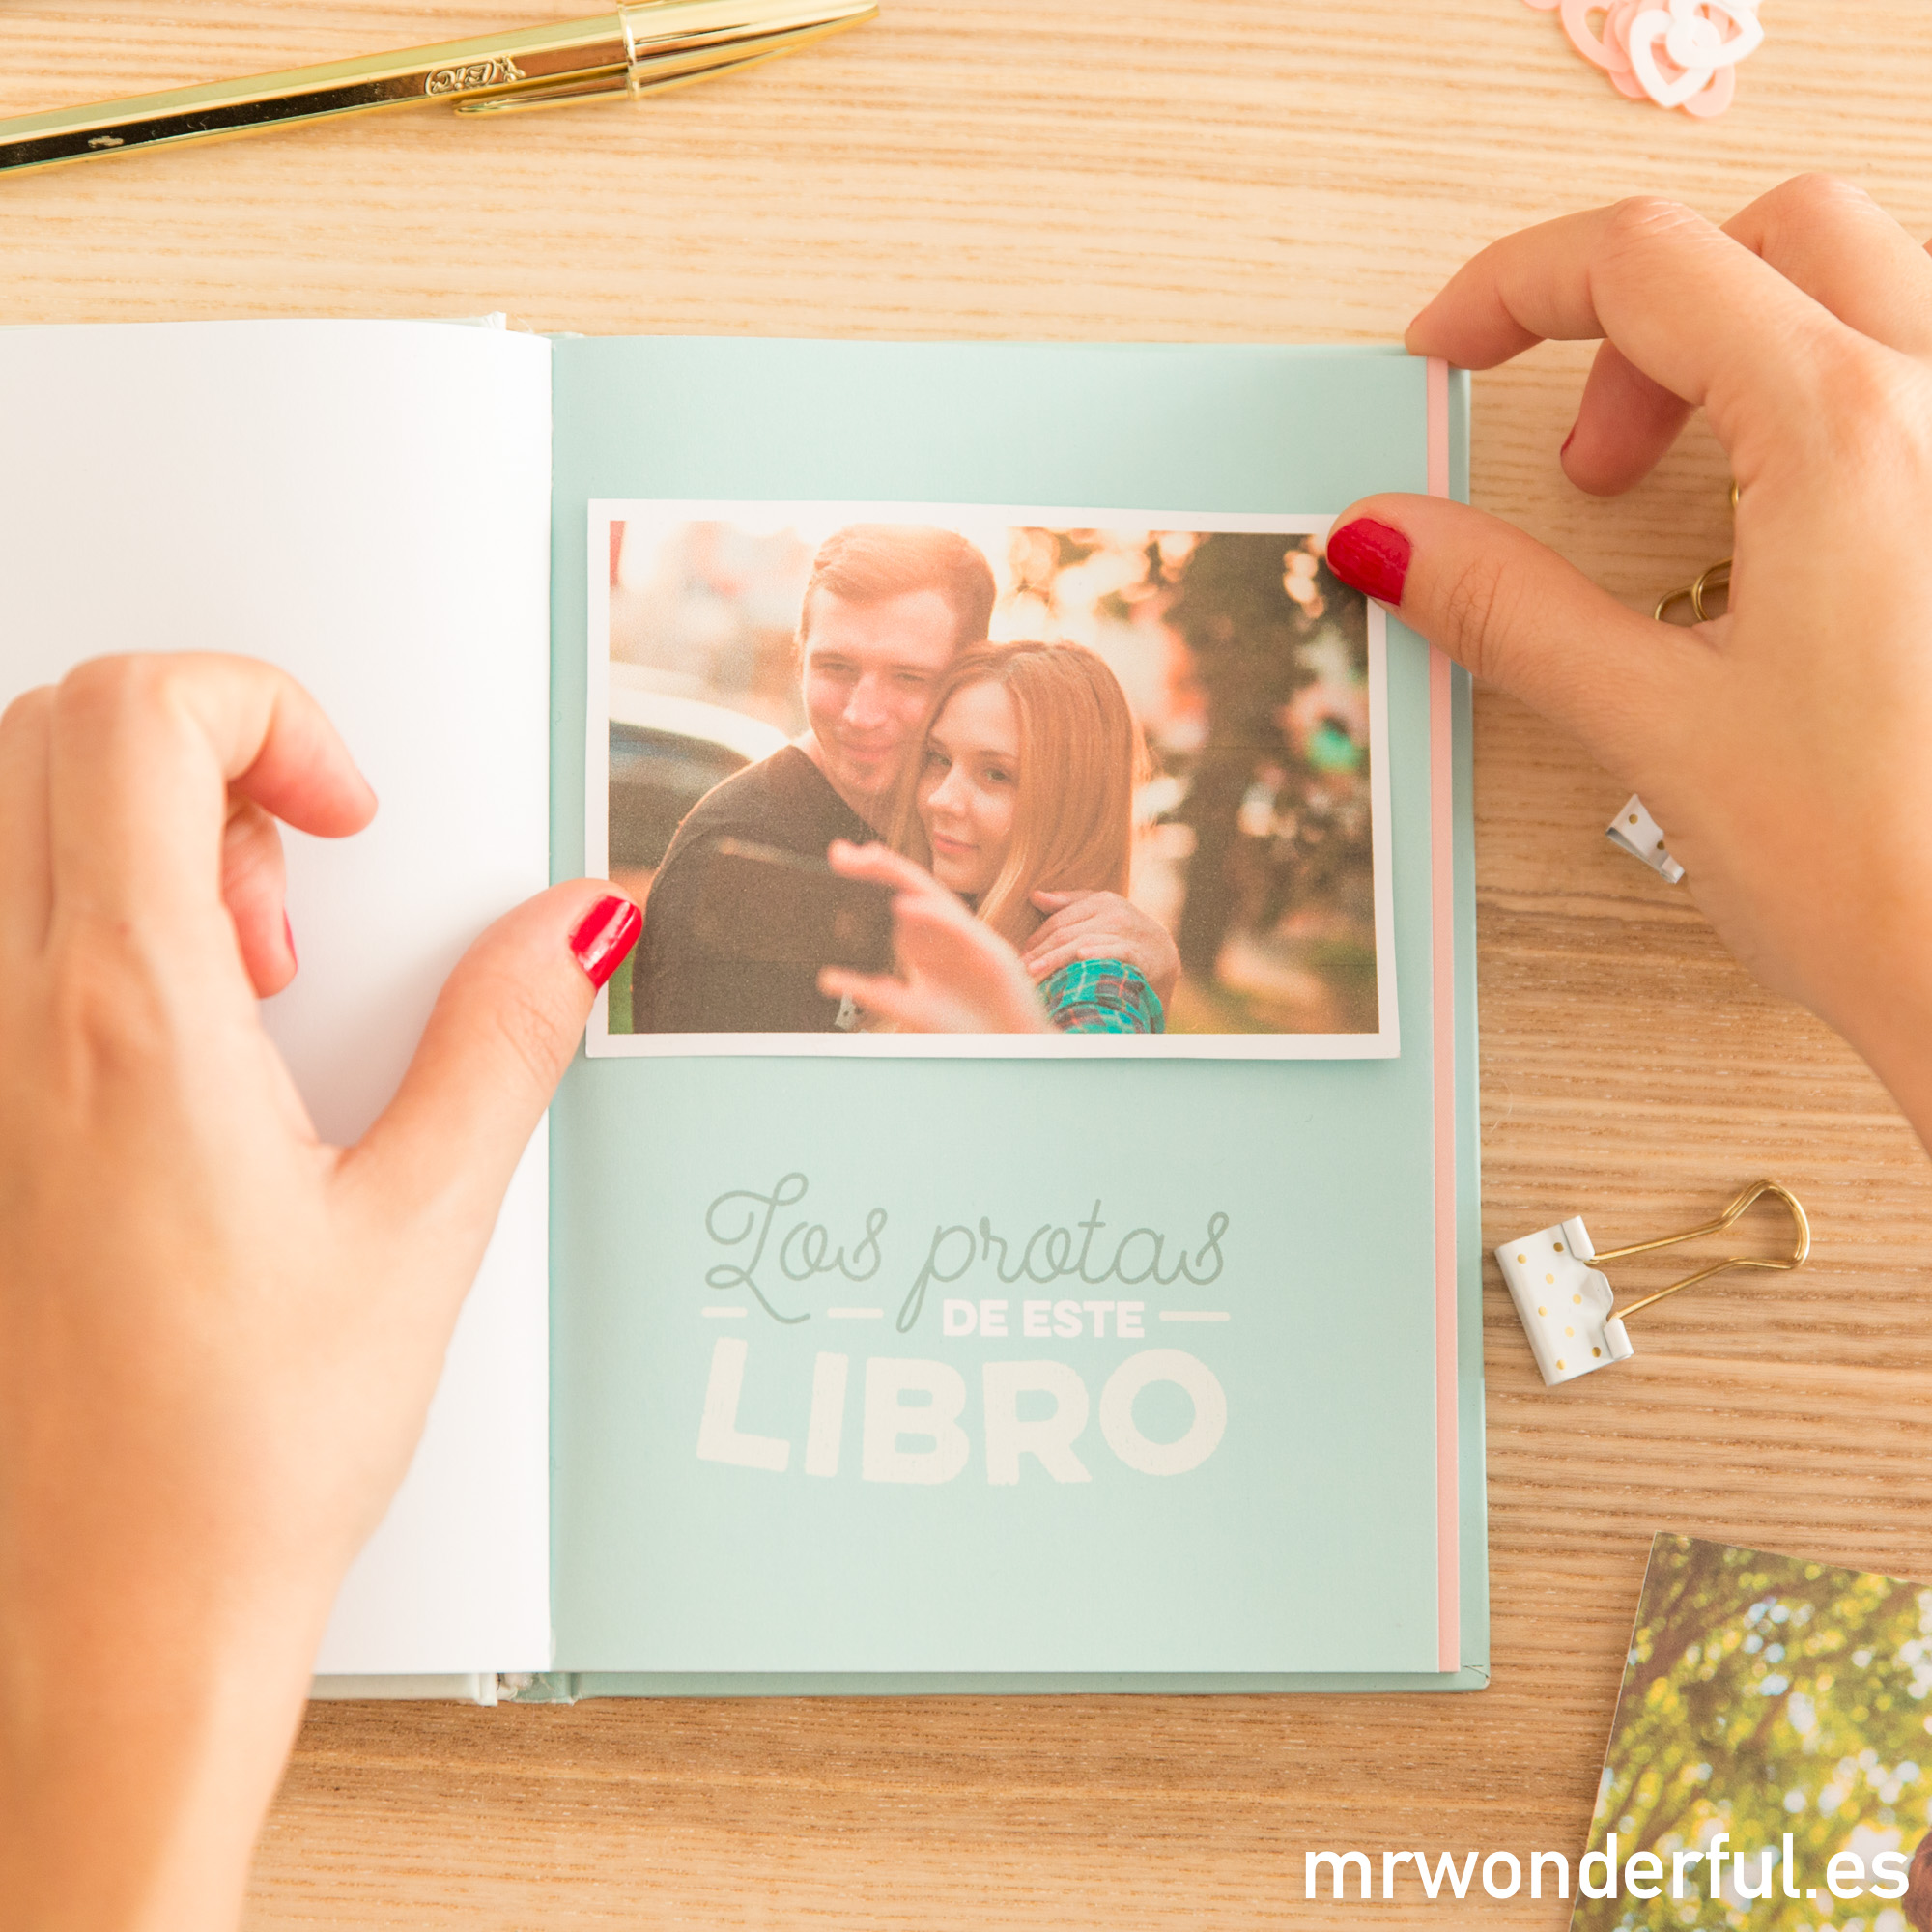 mrwonderful_8435460709941_libro-historias-tuyas-mias_es_2017-9-editar